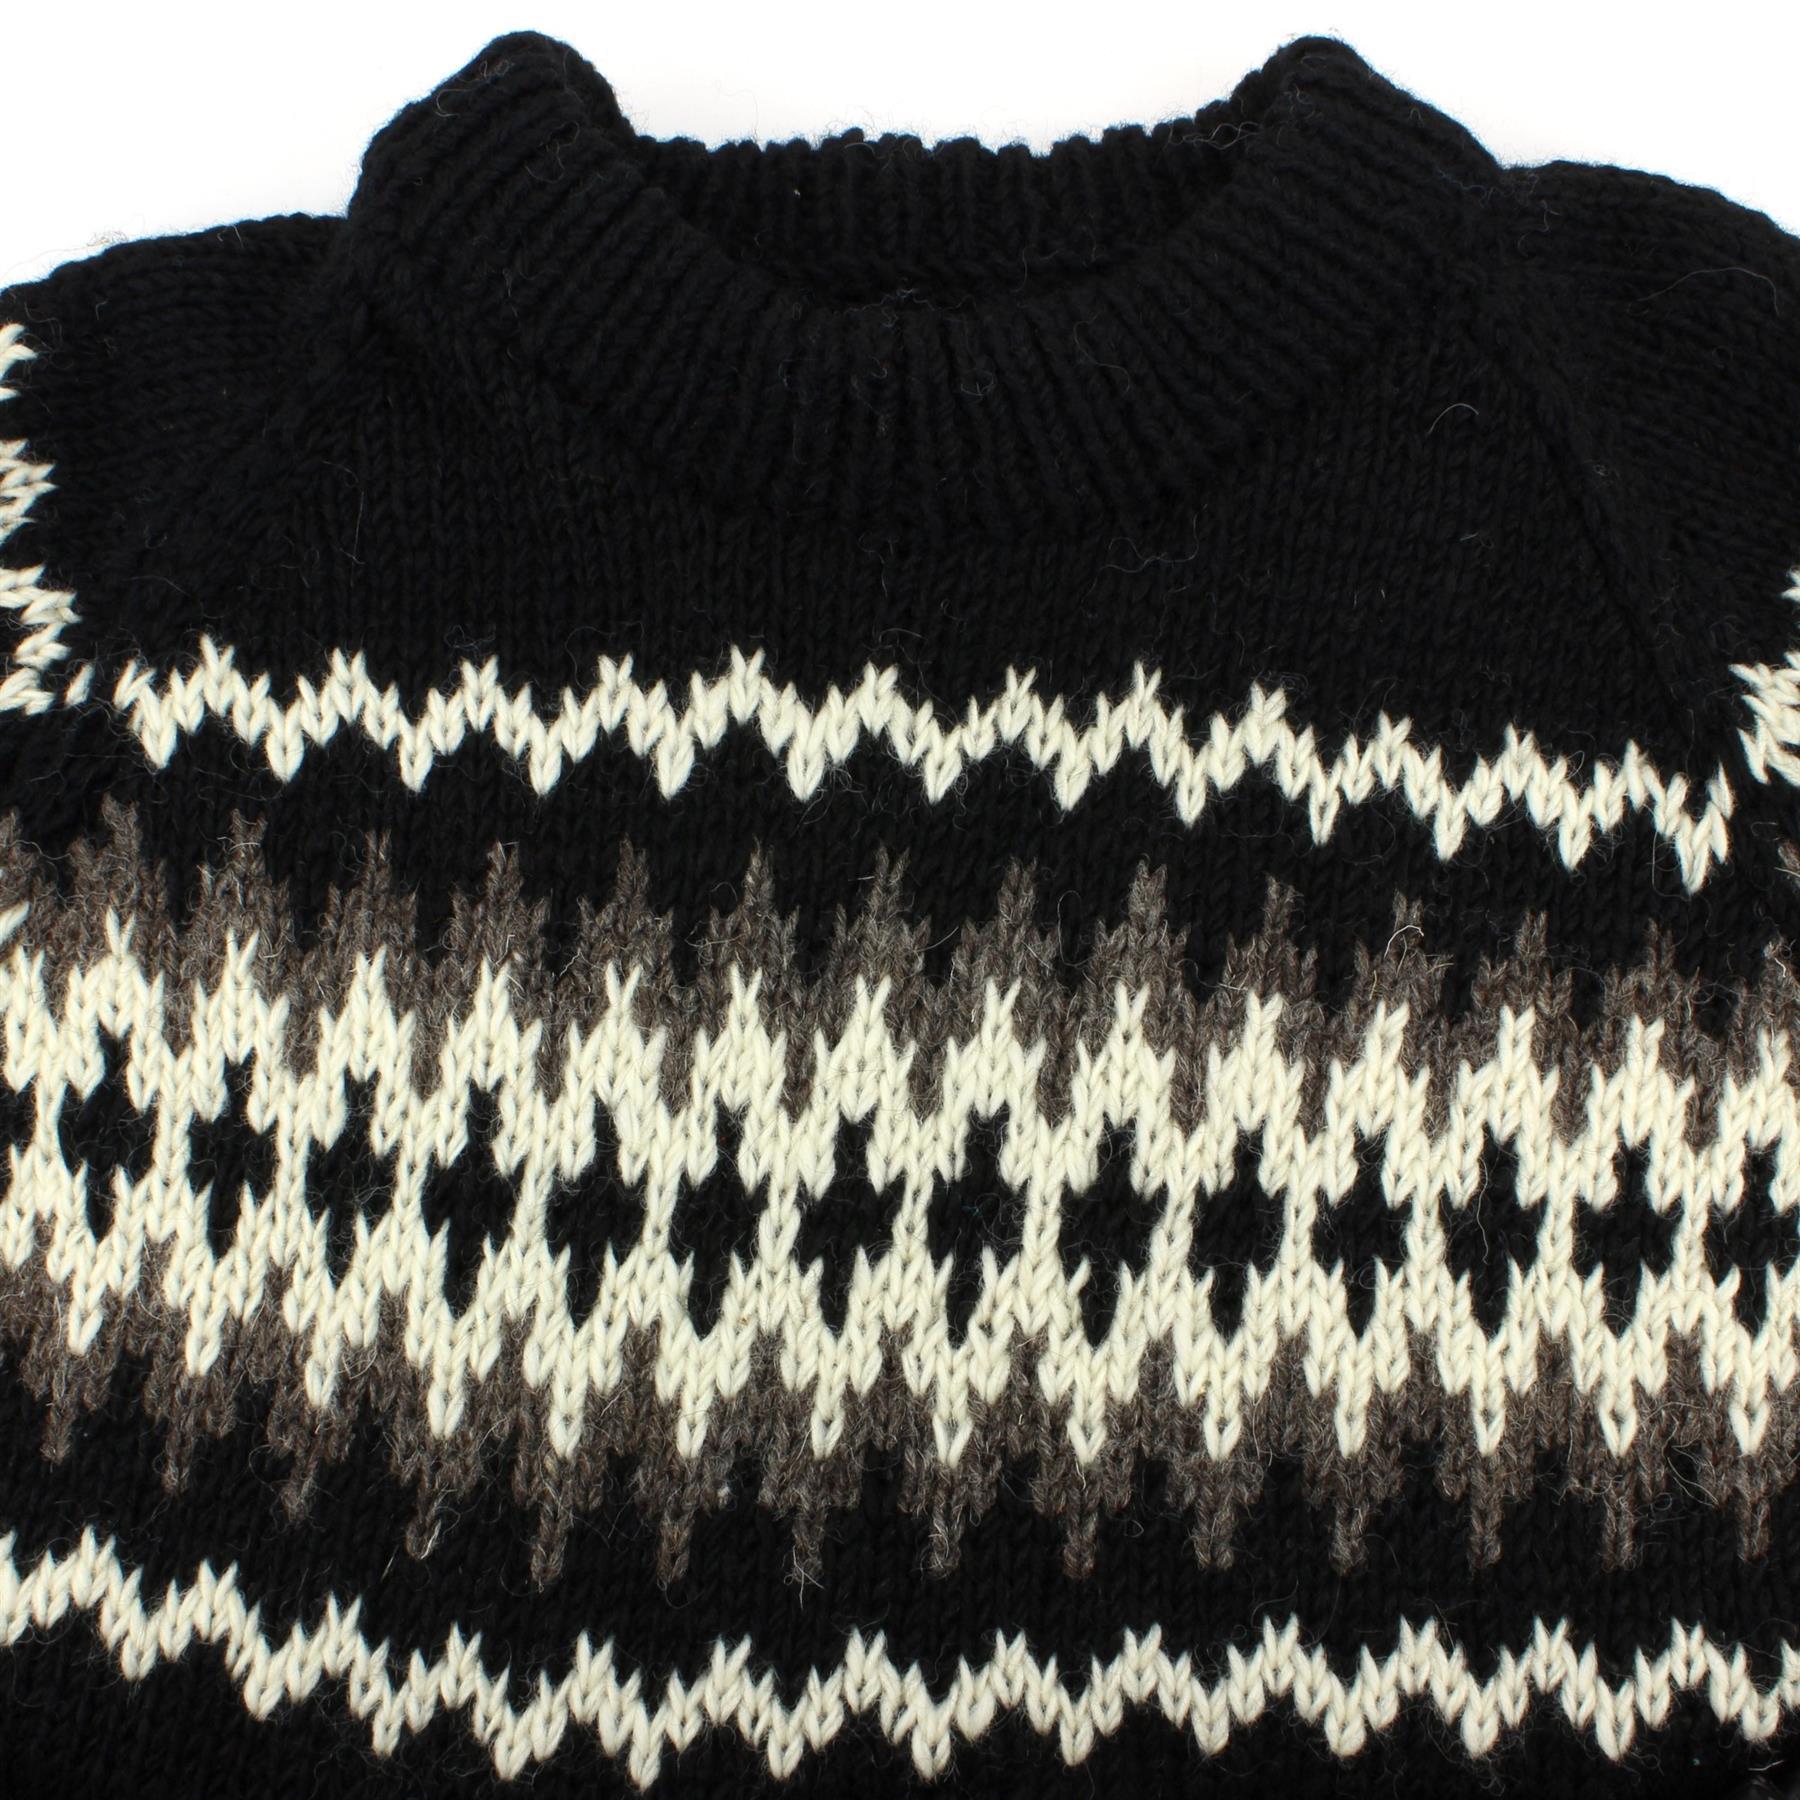 thumbnail 23 - Wool Knit Jumper Sweater Pullover Fairisle Nordic Abstract Warm Nepal Loose